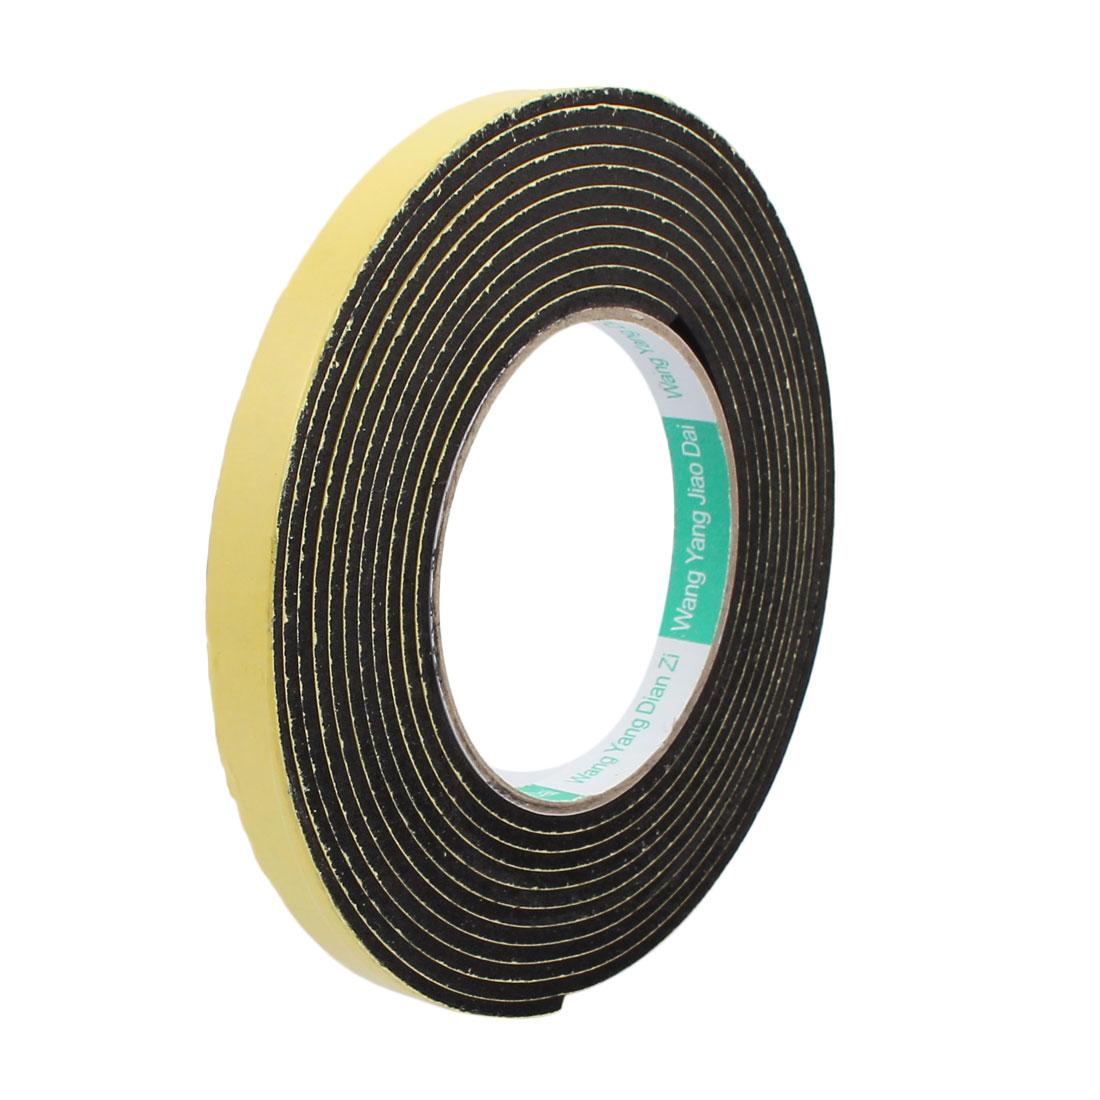 10mm Width 3mm Thick Single Sided Sealing Shockproof Sponge Tape 4m Length